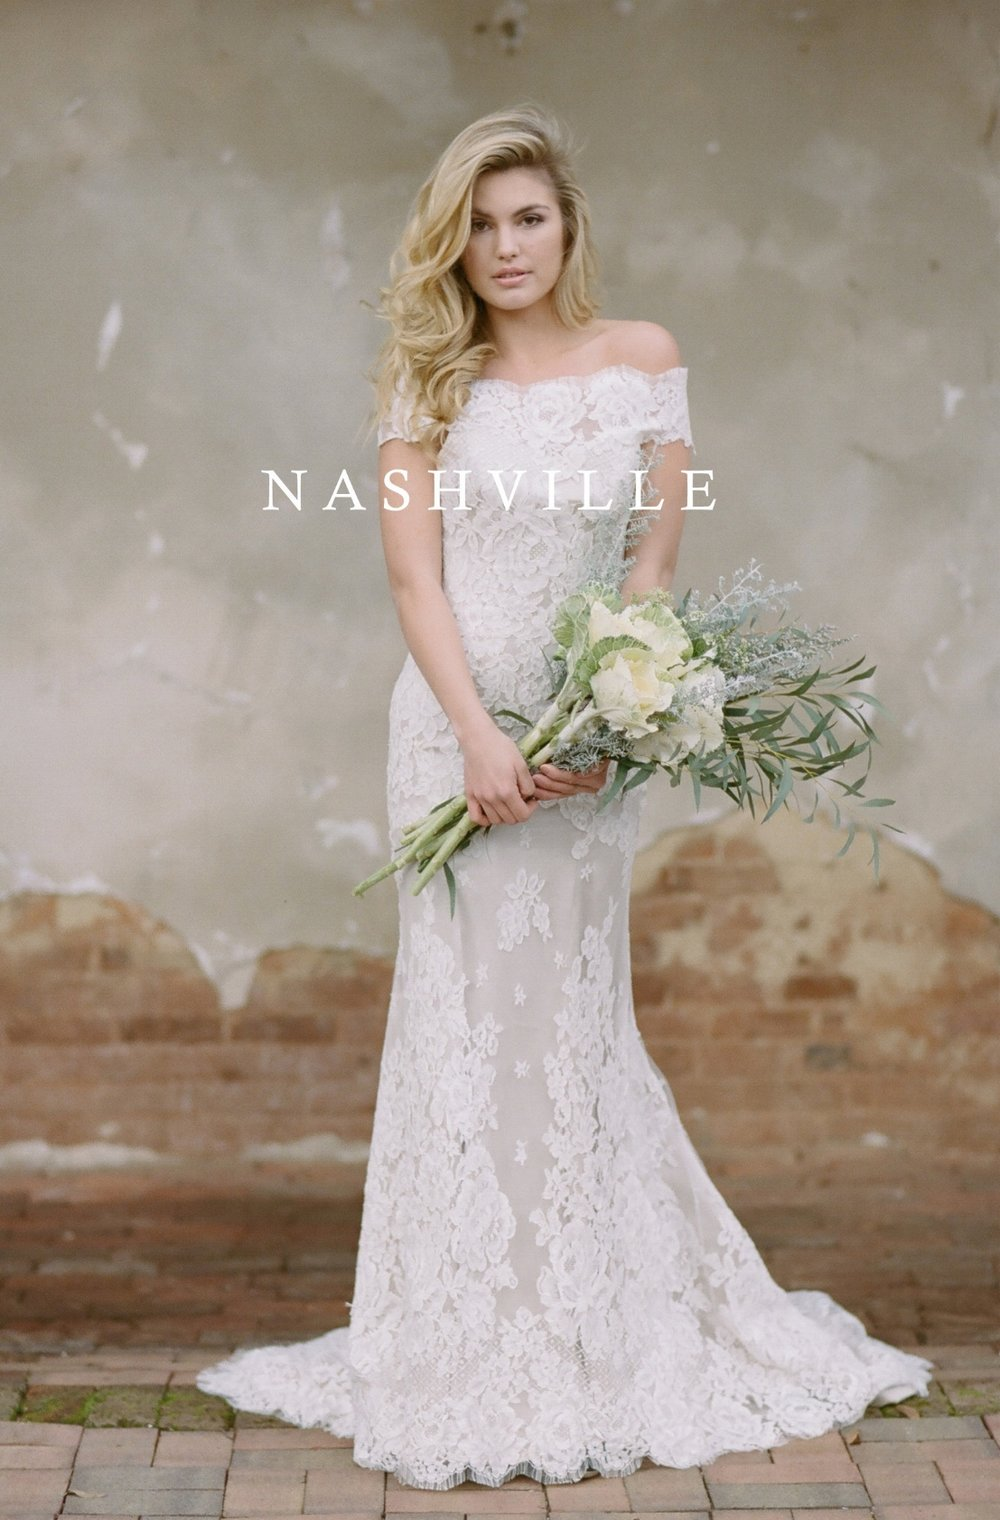 Nashville .jpg